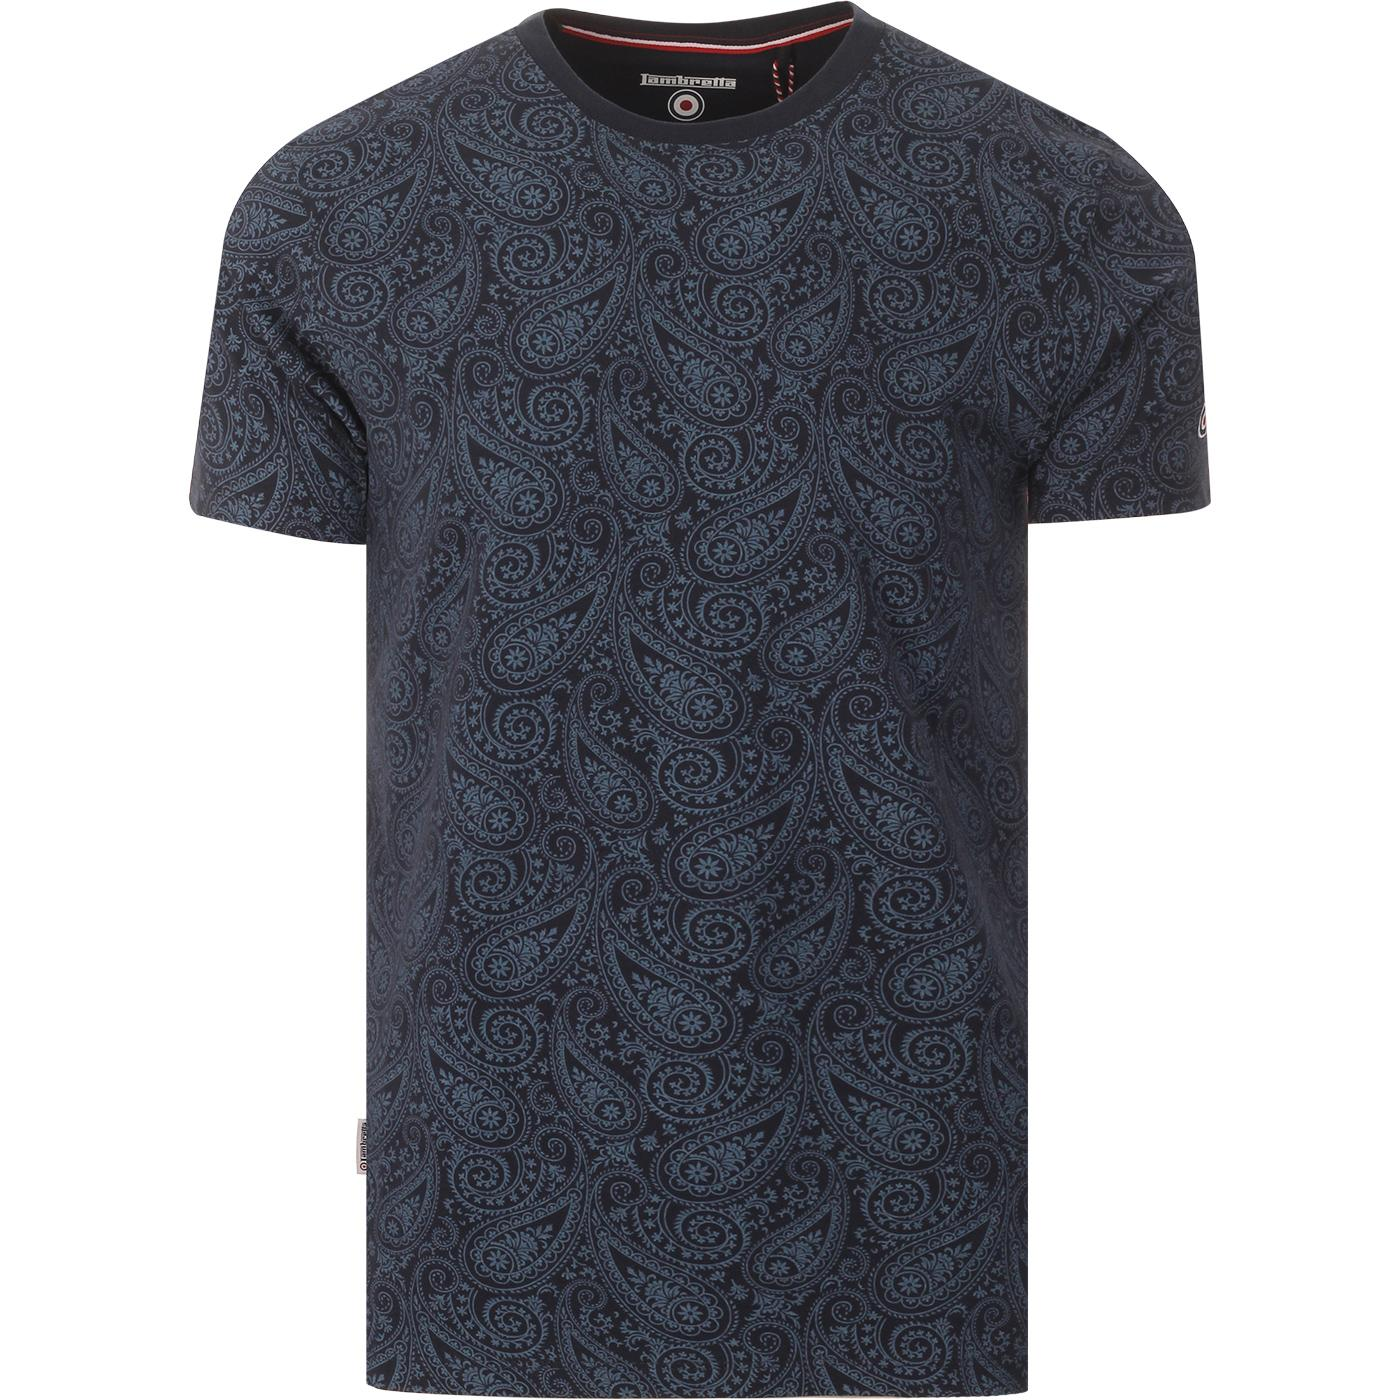 LAMBRETTA 60s Mod Paisley Print T-shirt (Navy)